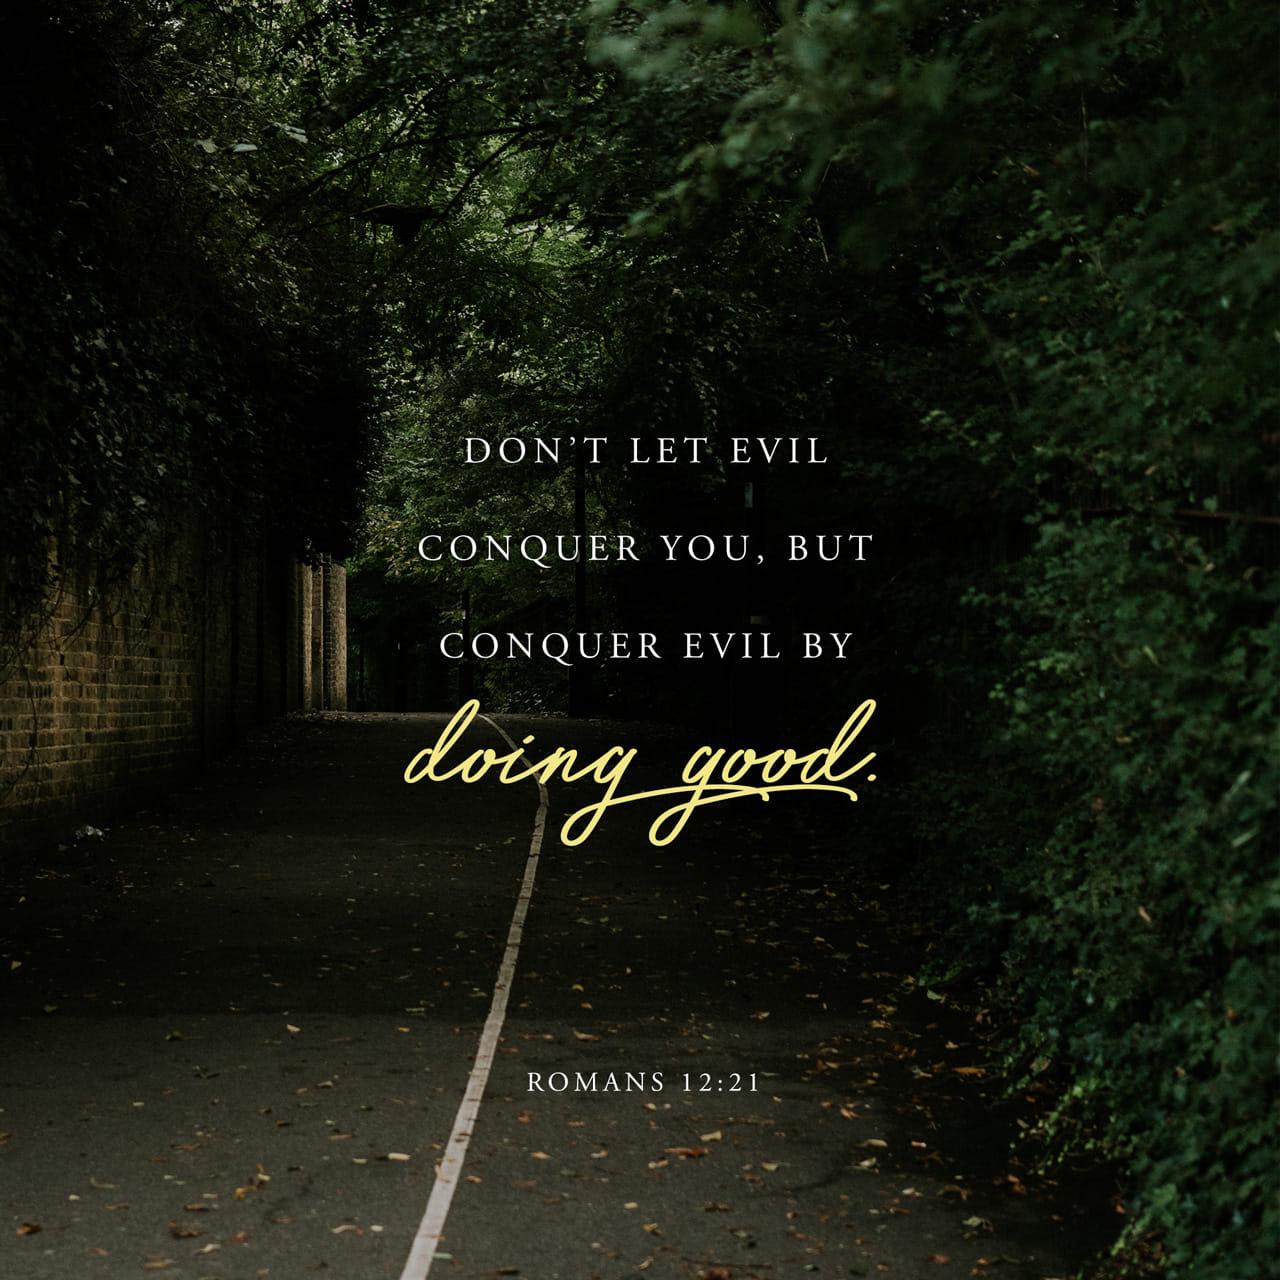 Romans 12:21 Be not overcome of evil, but overcome evil with good. | King James Version (KJV)